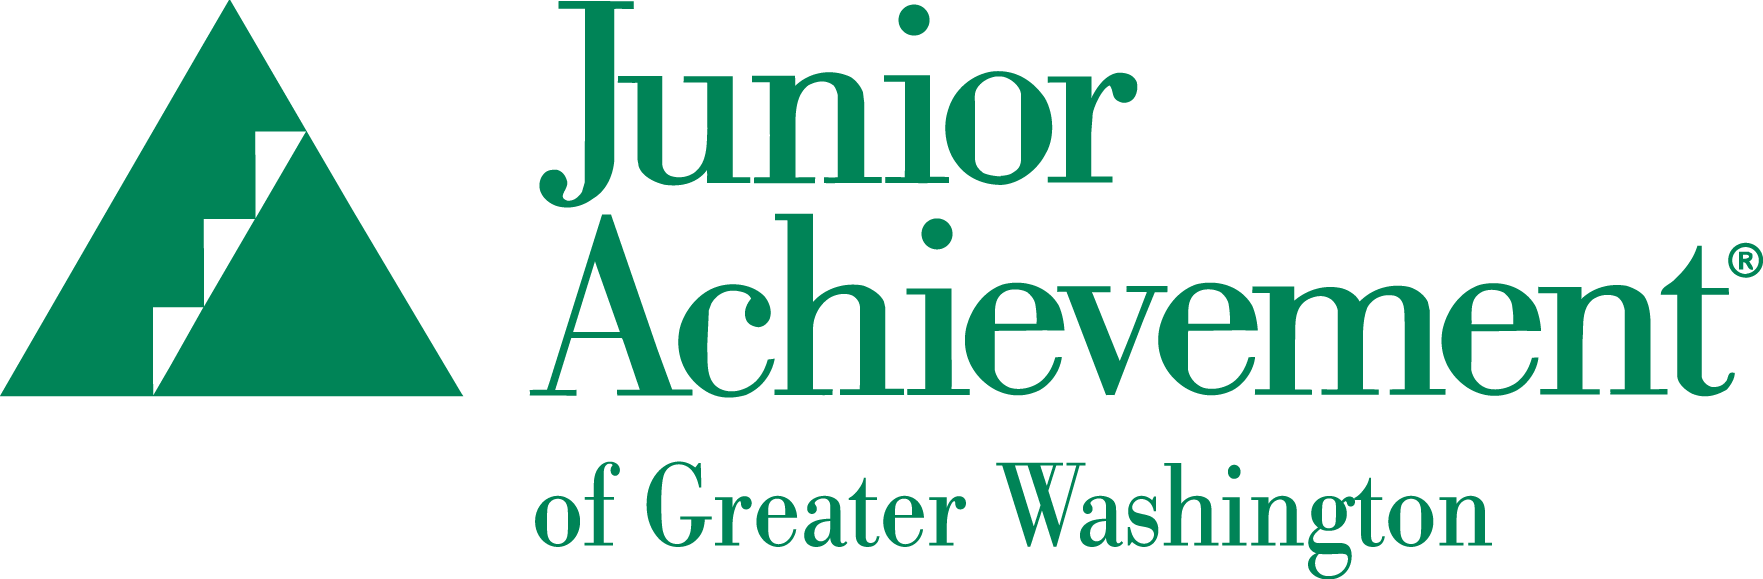 junior achievement of greater washington - logo image